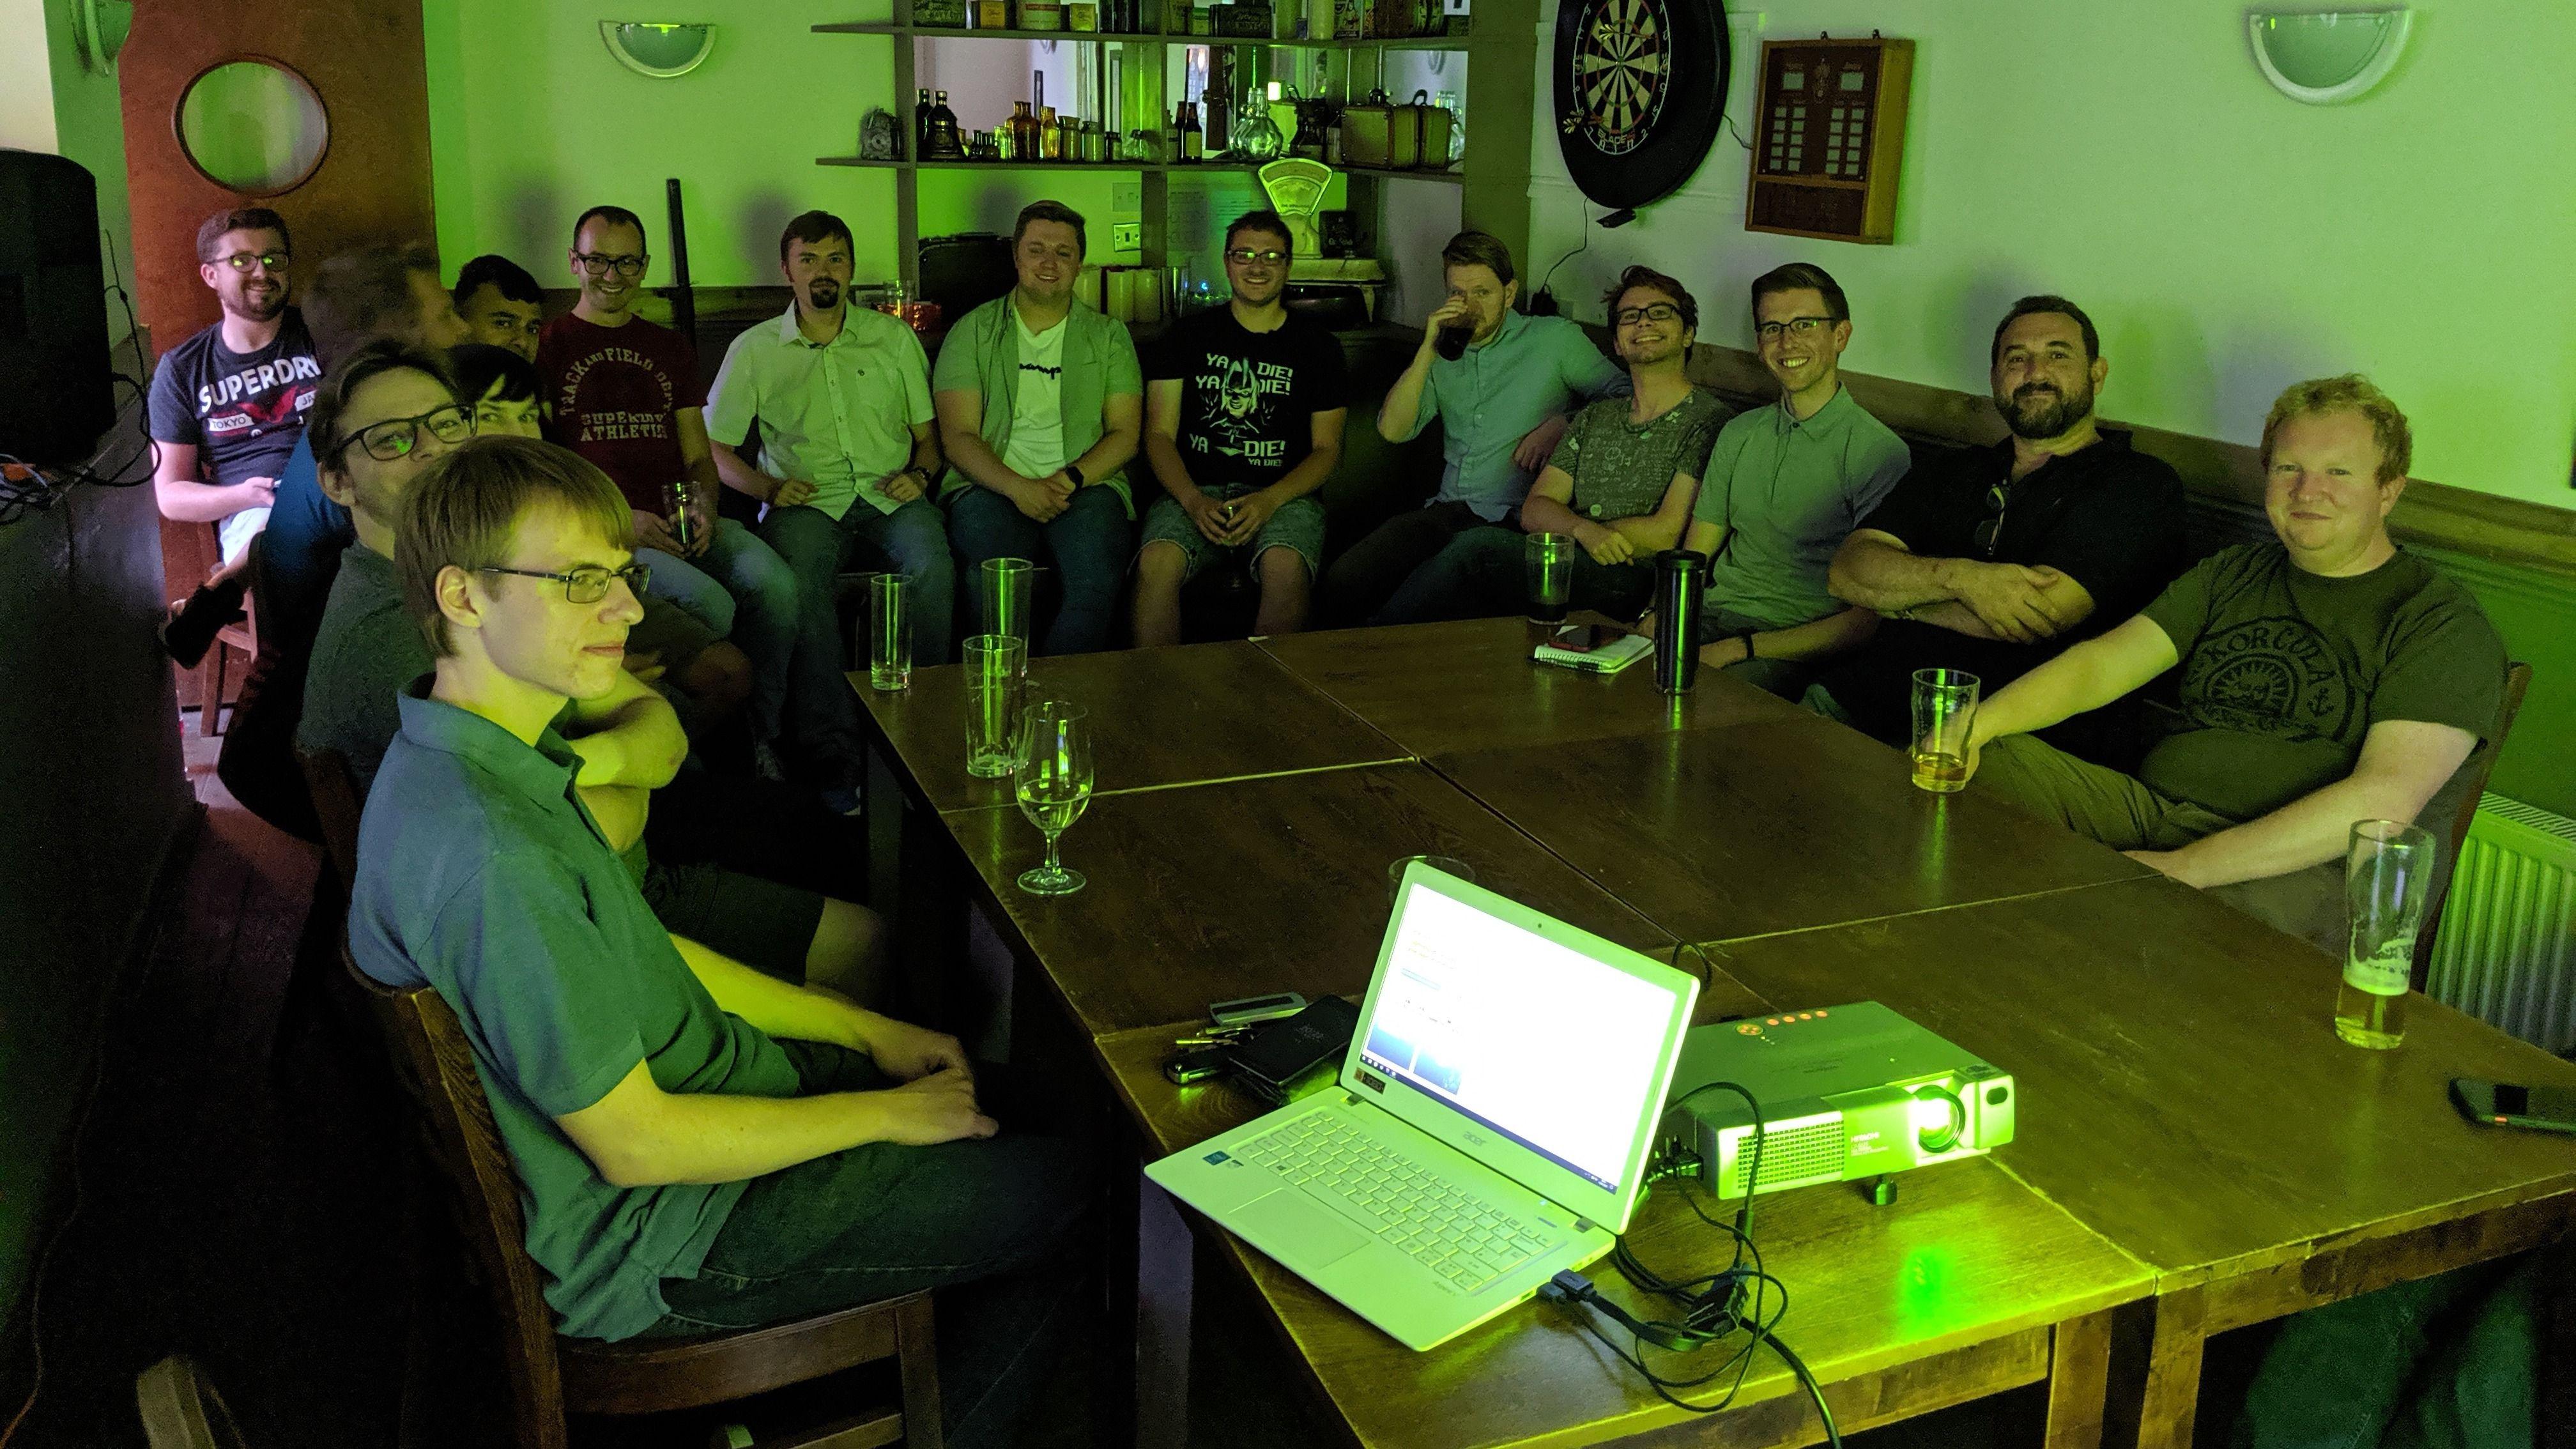 Essex Web Developers